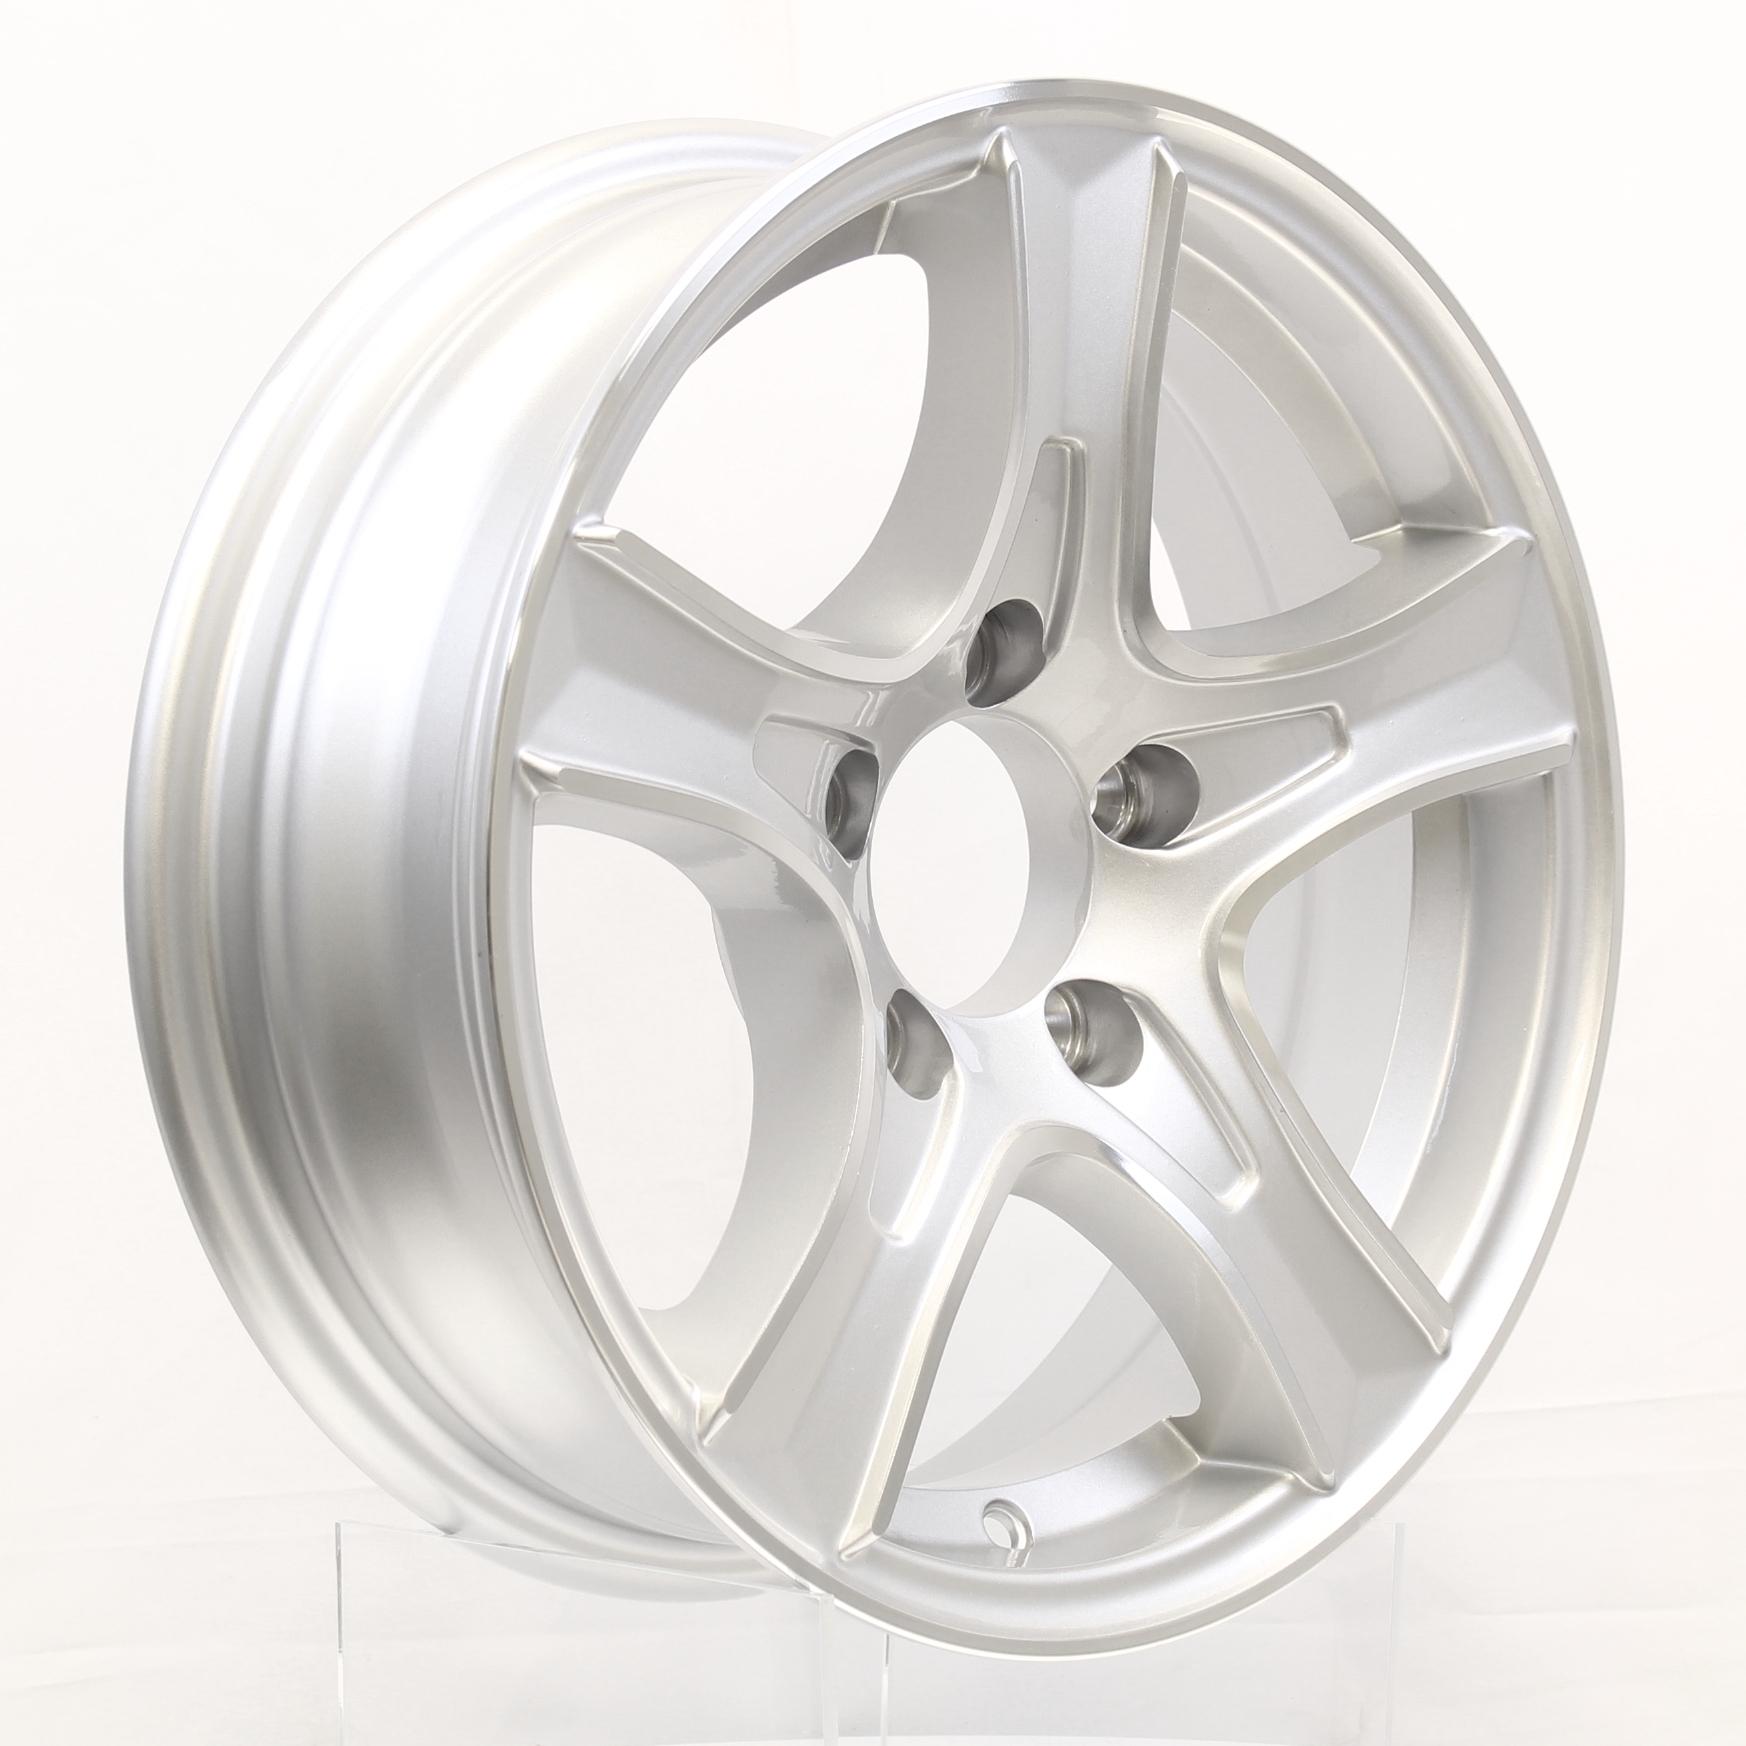 Thoroughbred 15x5 5-Lug Silver Aluminum Trailer Wheel Image